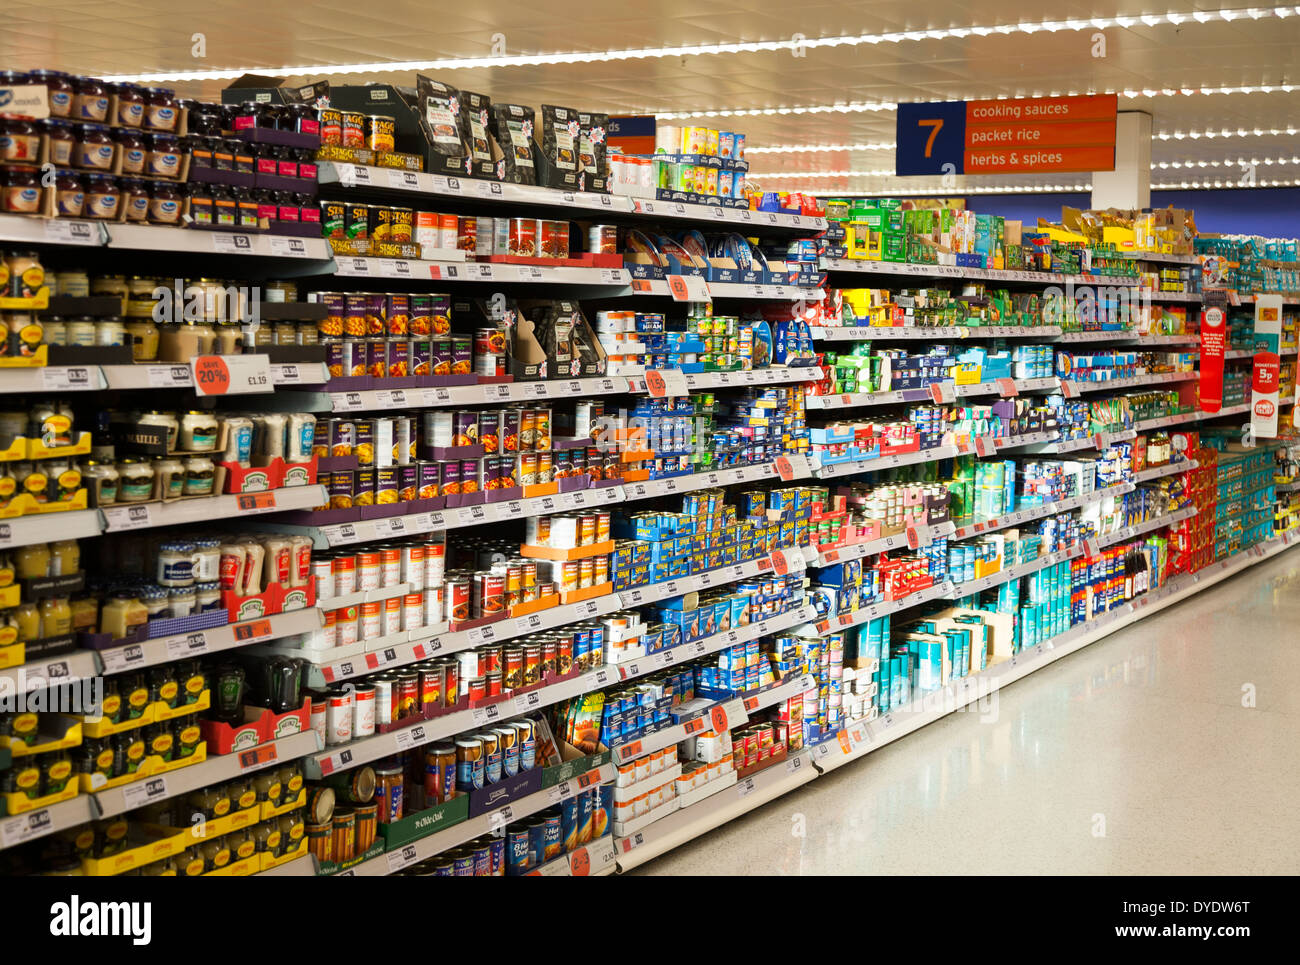 White apron sainsburys - Sainsbury S Sainsburys Aisle Aisles In A Uk Store Shop Supermarket Stock